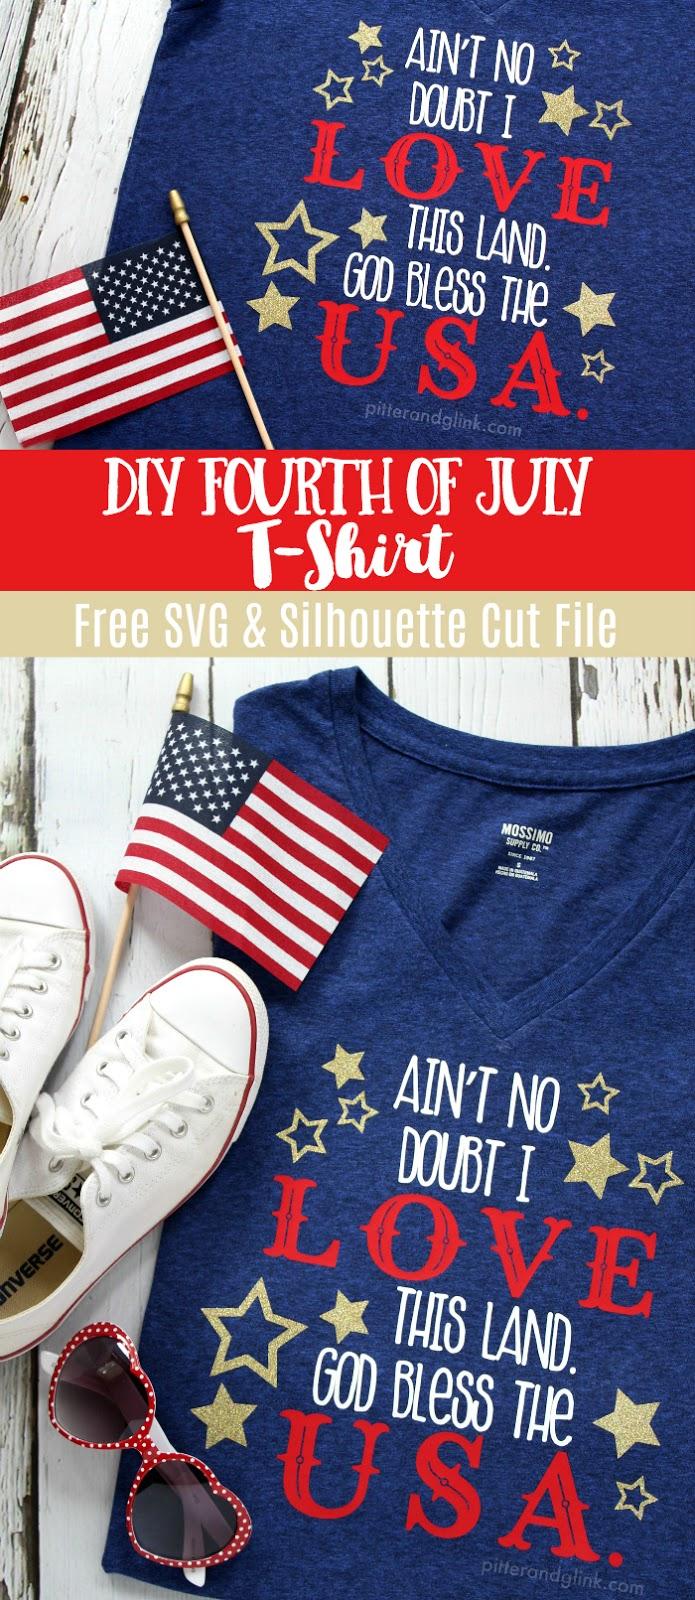 DIY Fourth of July T-shirt + Free Cut File